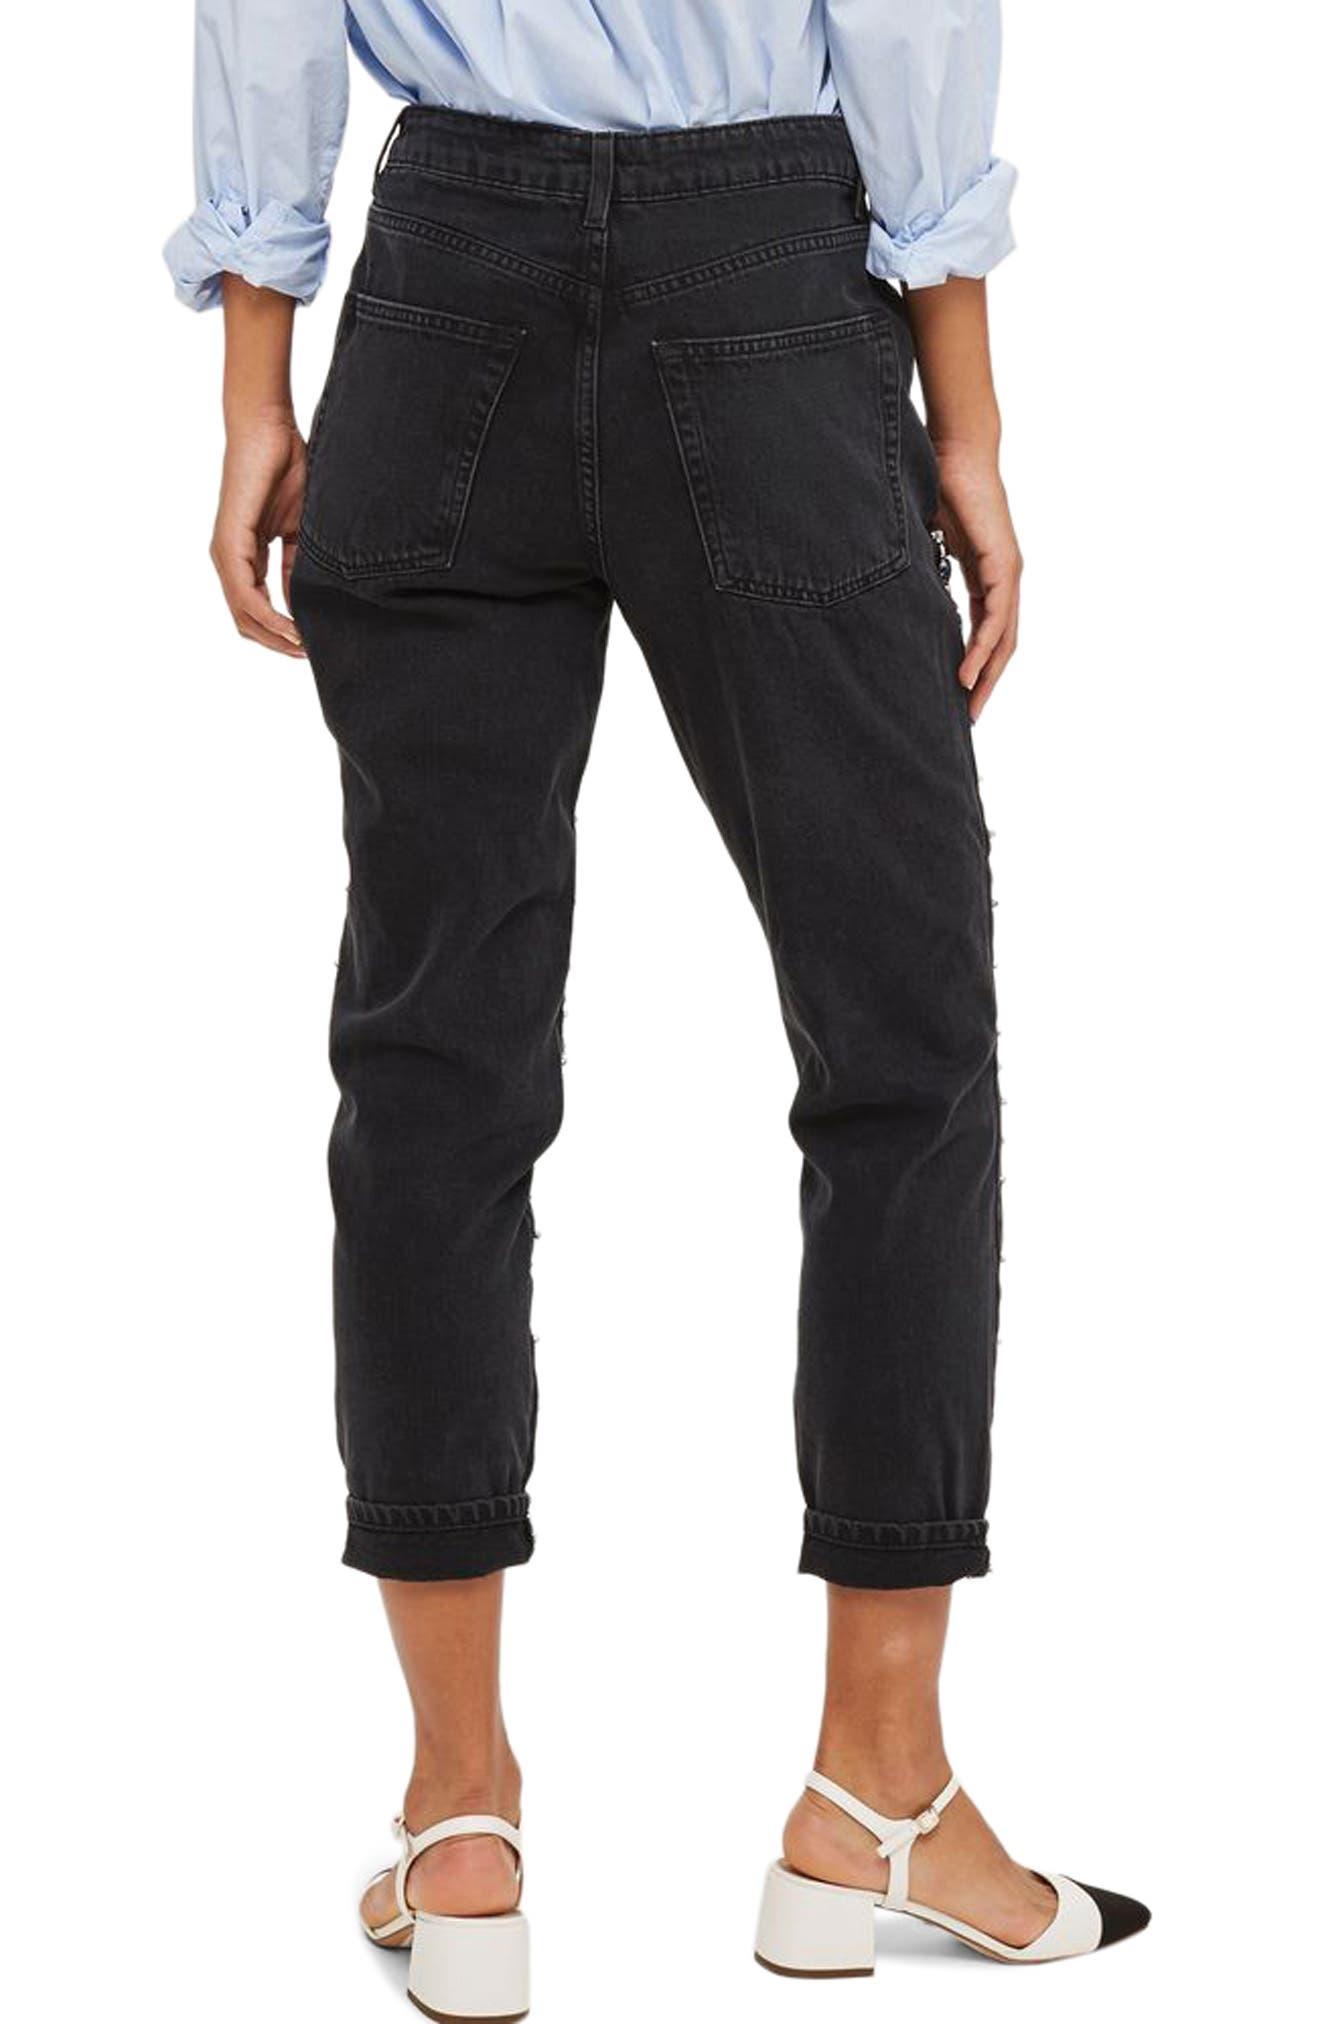 Limited Edition Gem Super Rip Mom Jeans,                             Alternate thumbnail 3, color,                             Washed Black